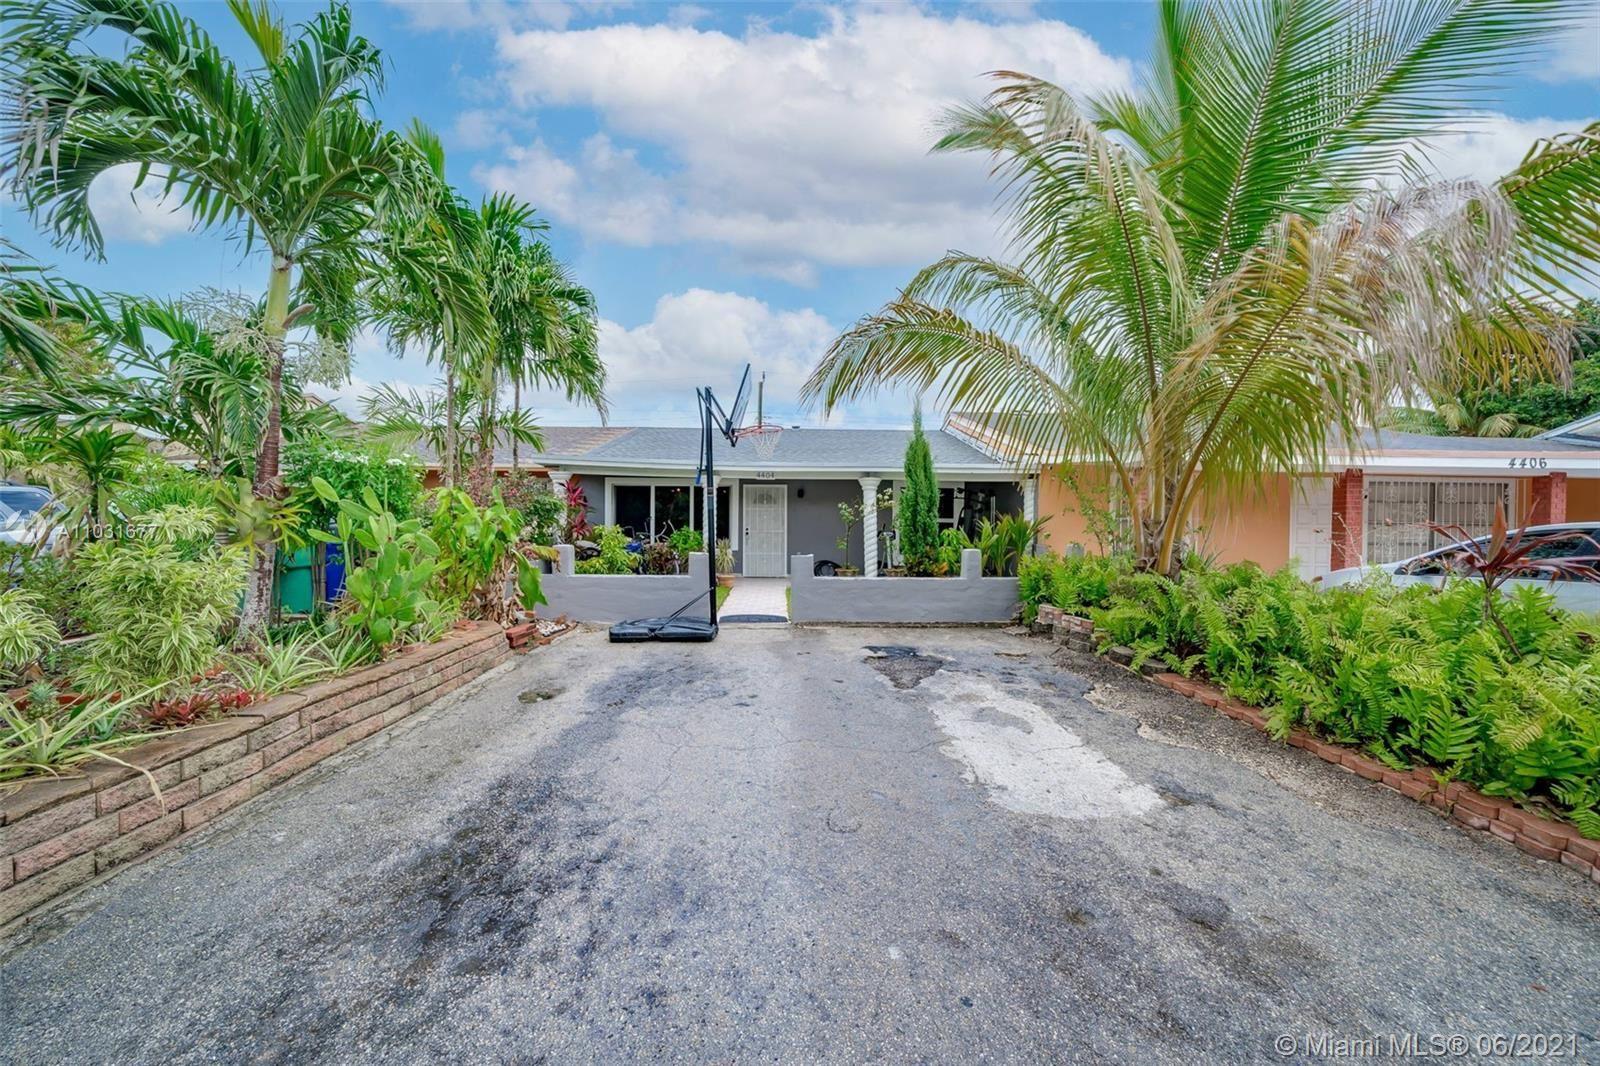 4404 NW 185th St, Miami Gardens, FL 33055 - #: A11031677